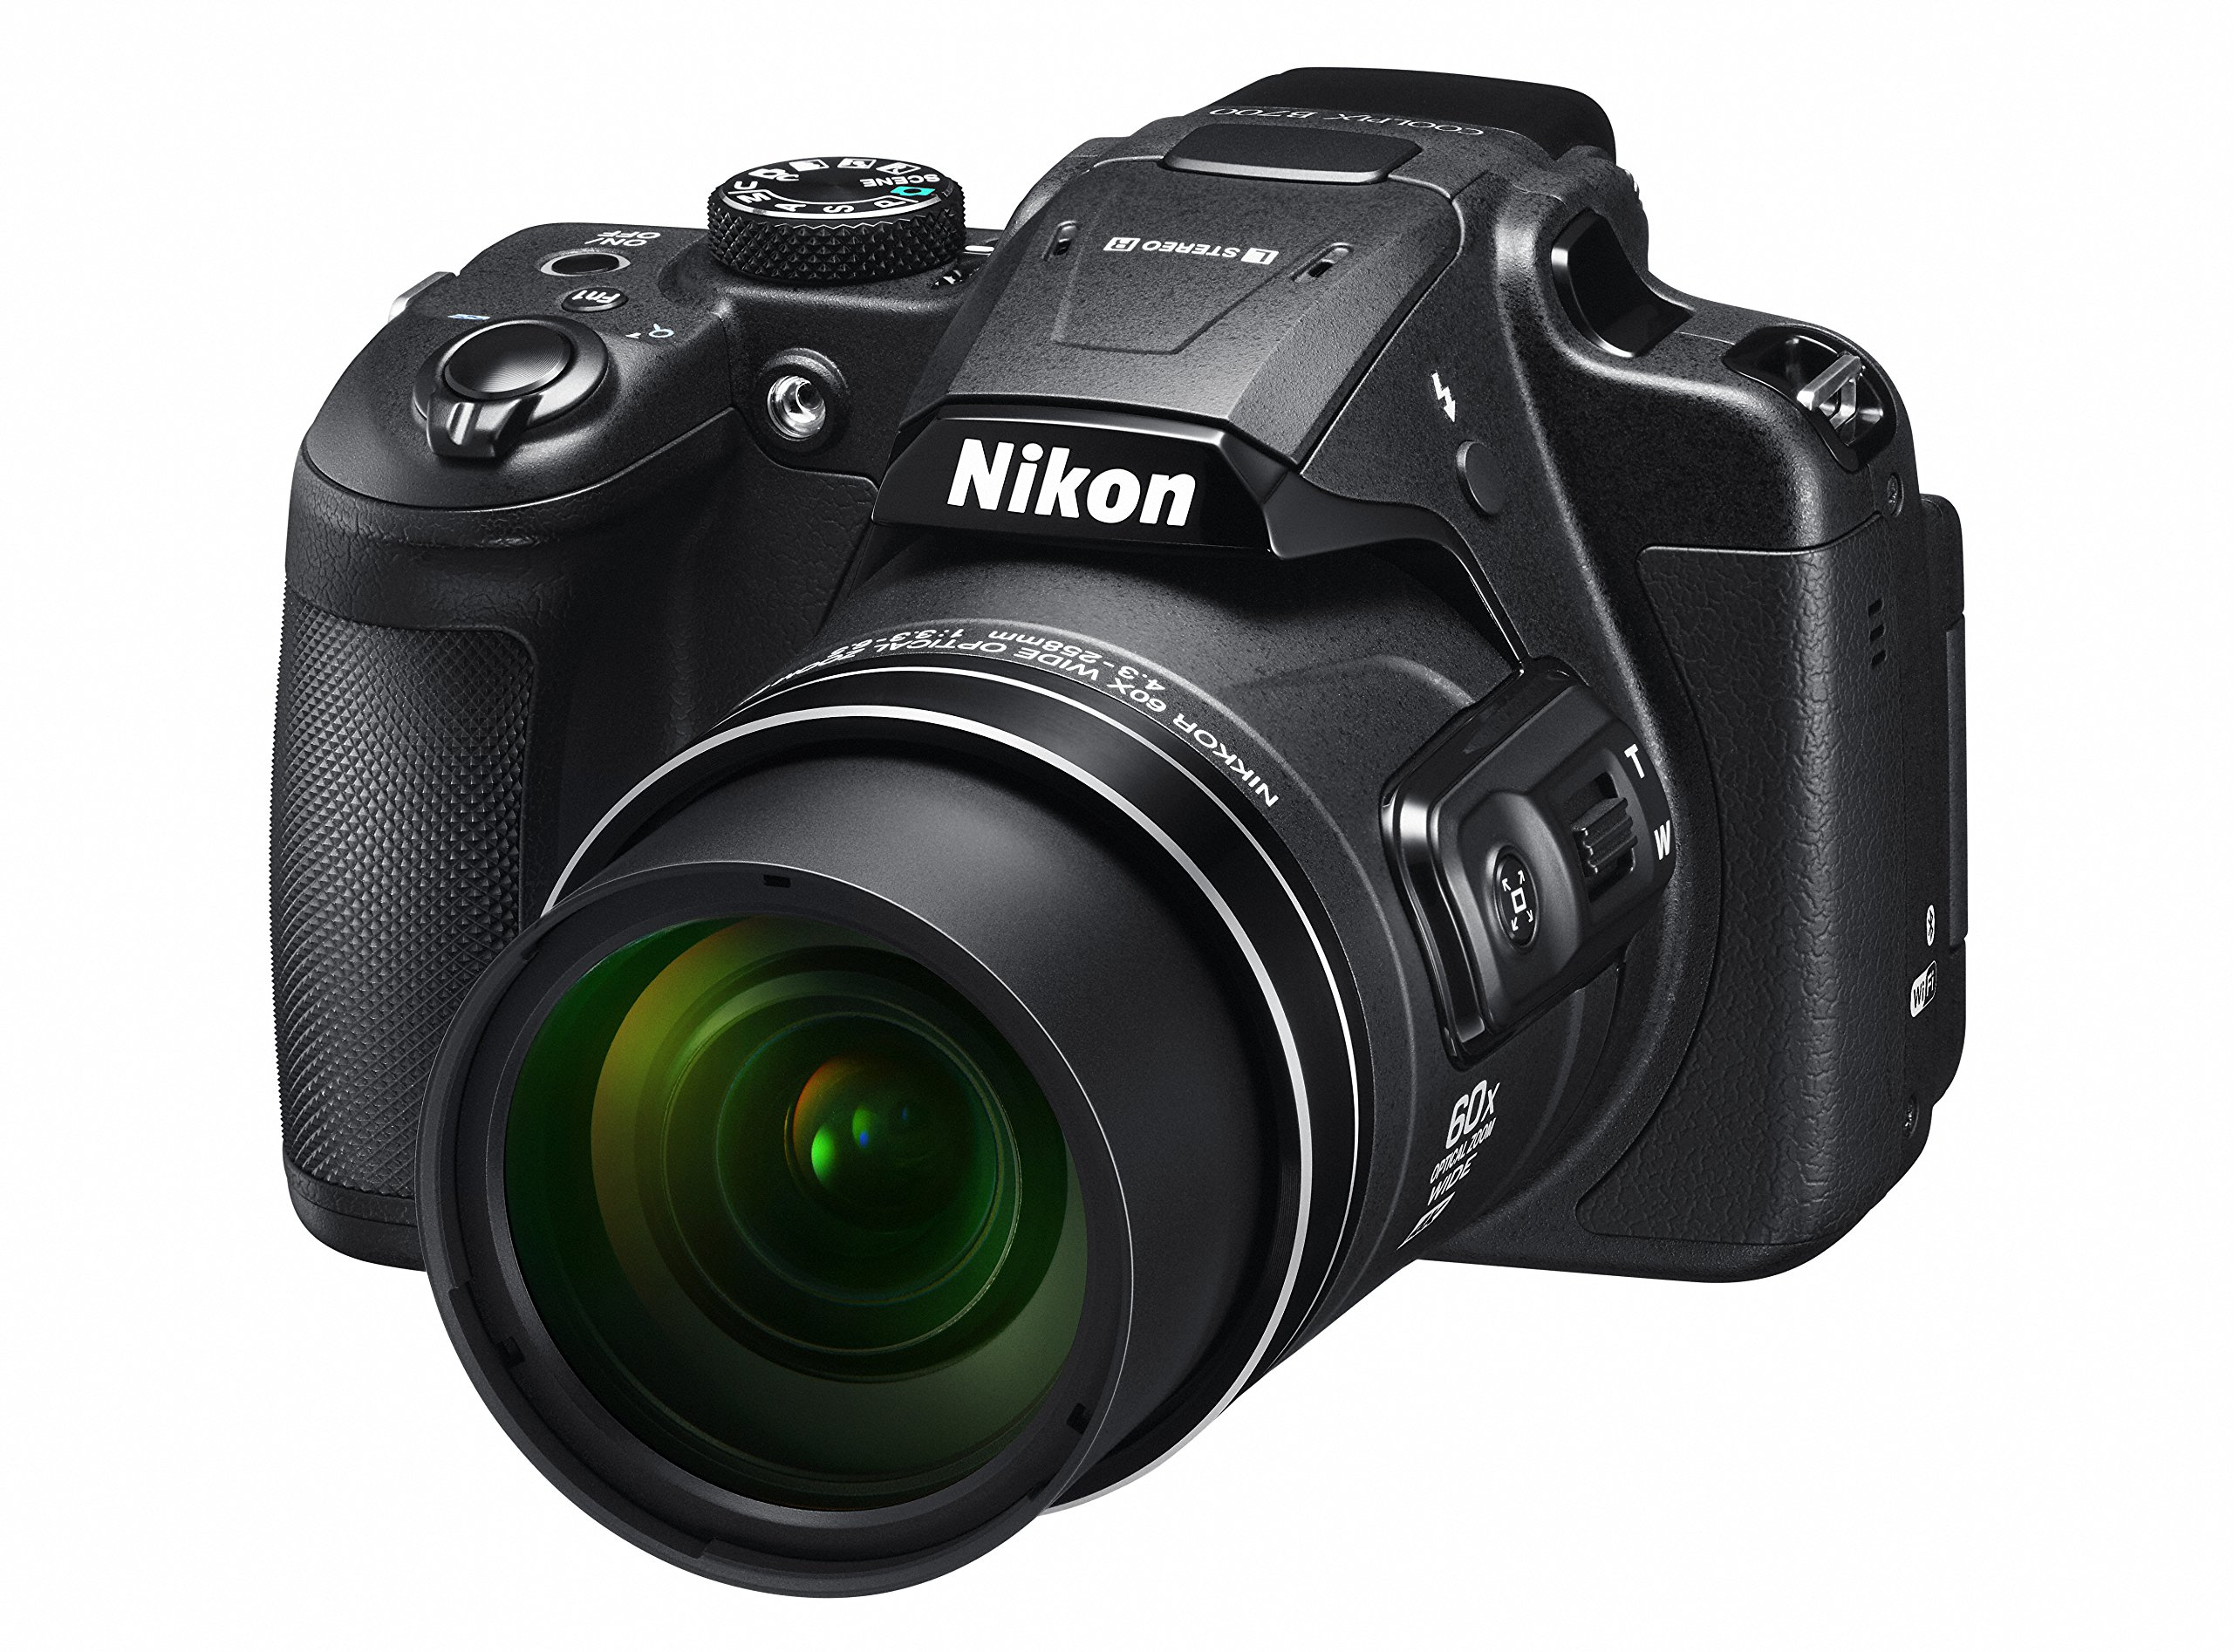 Nikon デジタルカメラ COOLPIX B700 光学60倍ズーム 2029万画素